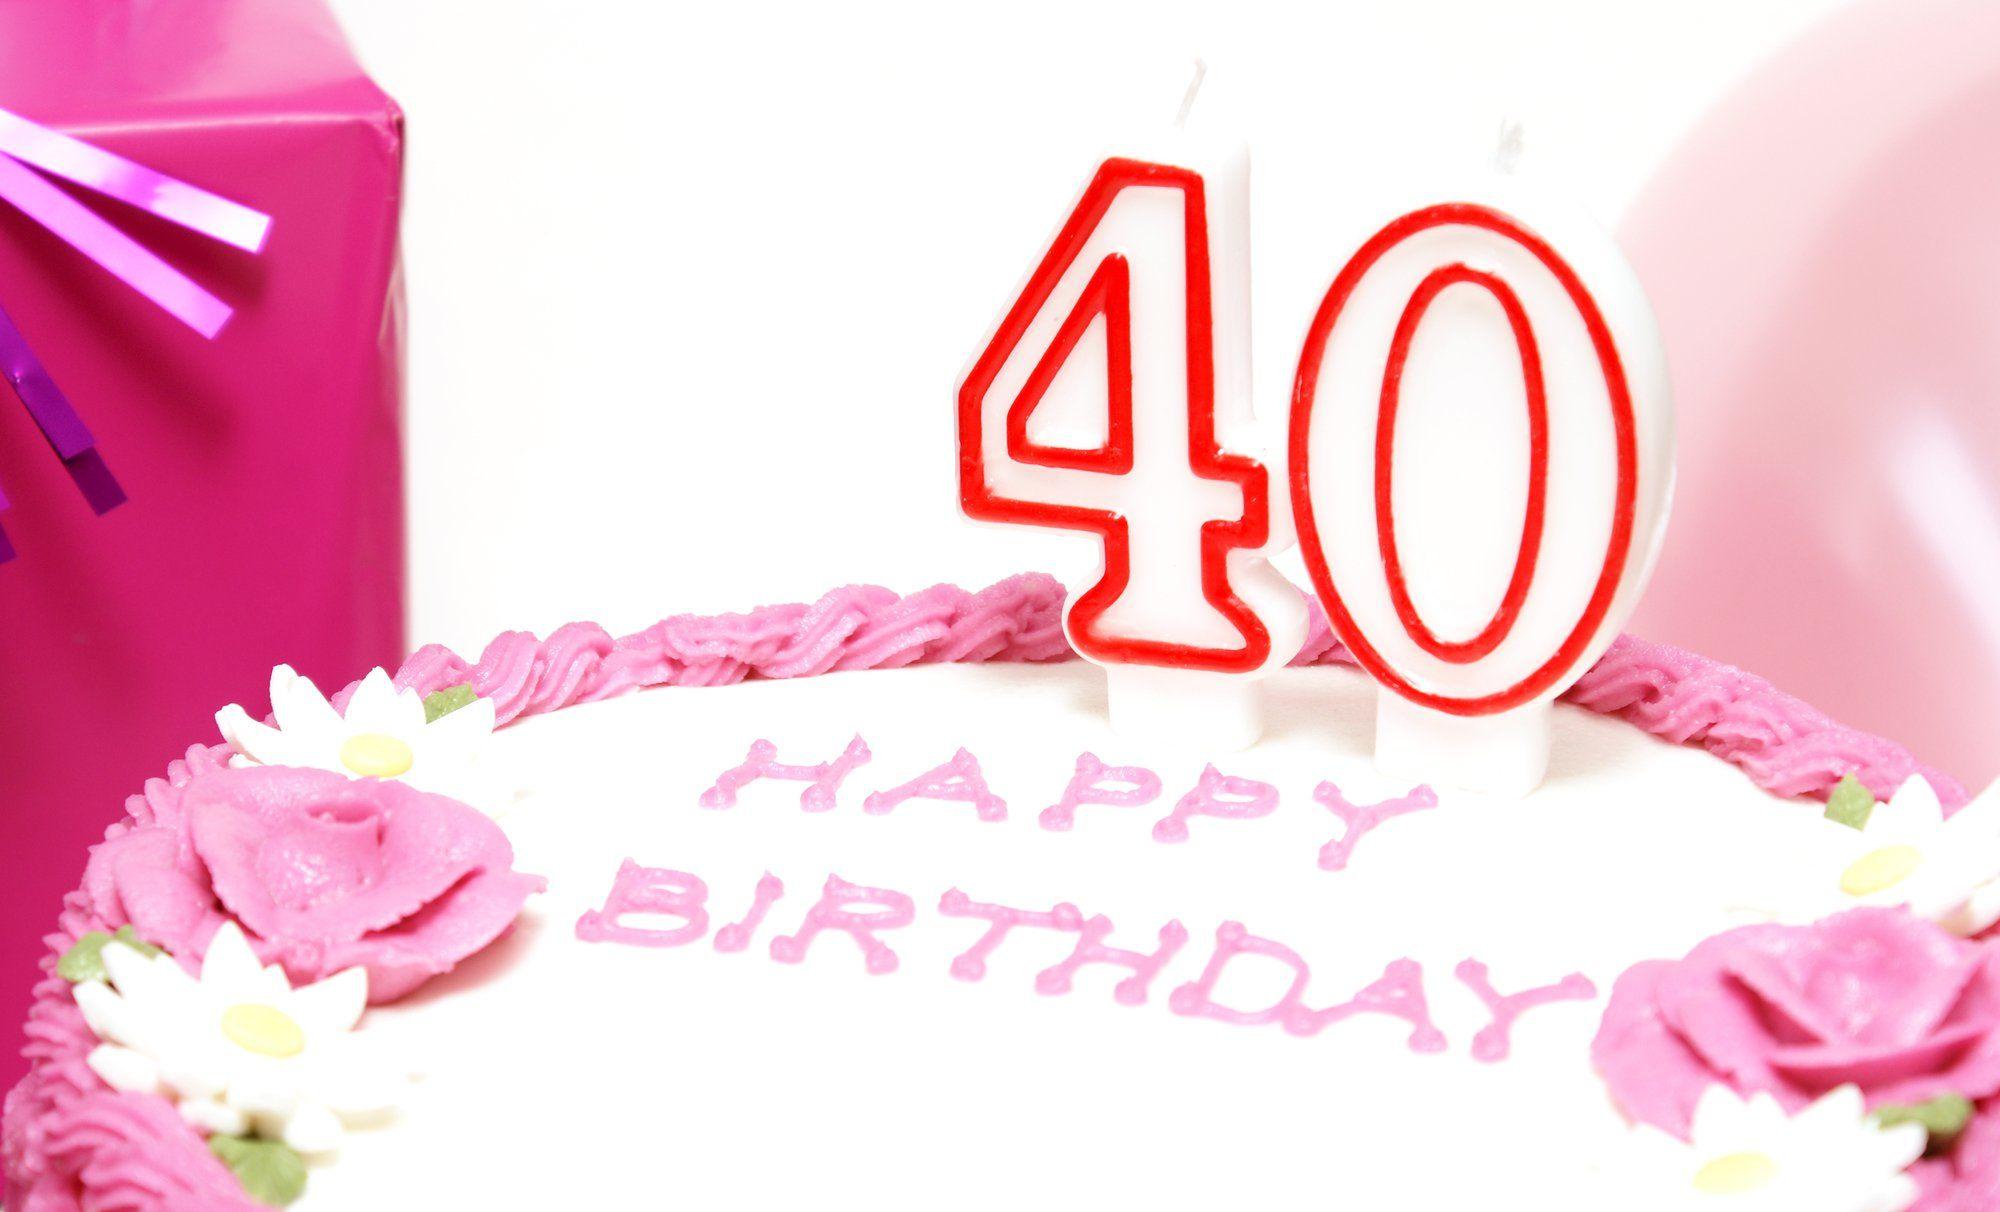 40th Birthday Invitation Wording | fun | Pinterest | 40 birthday and ...